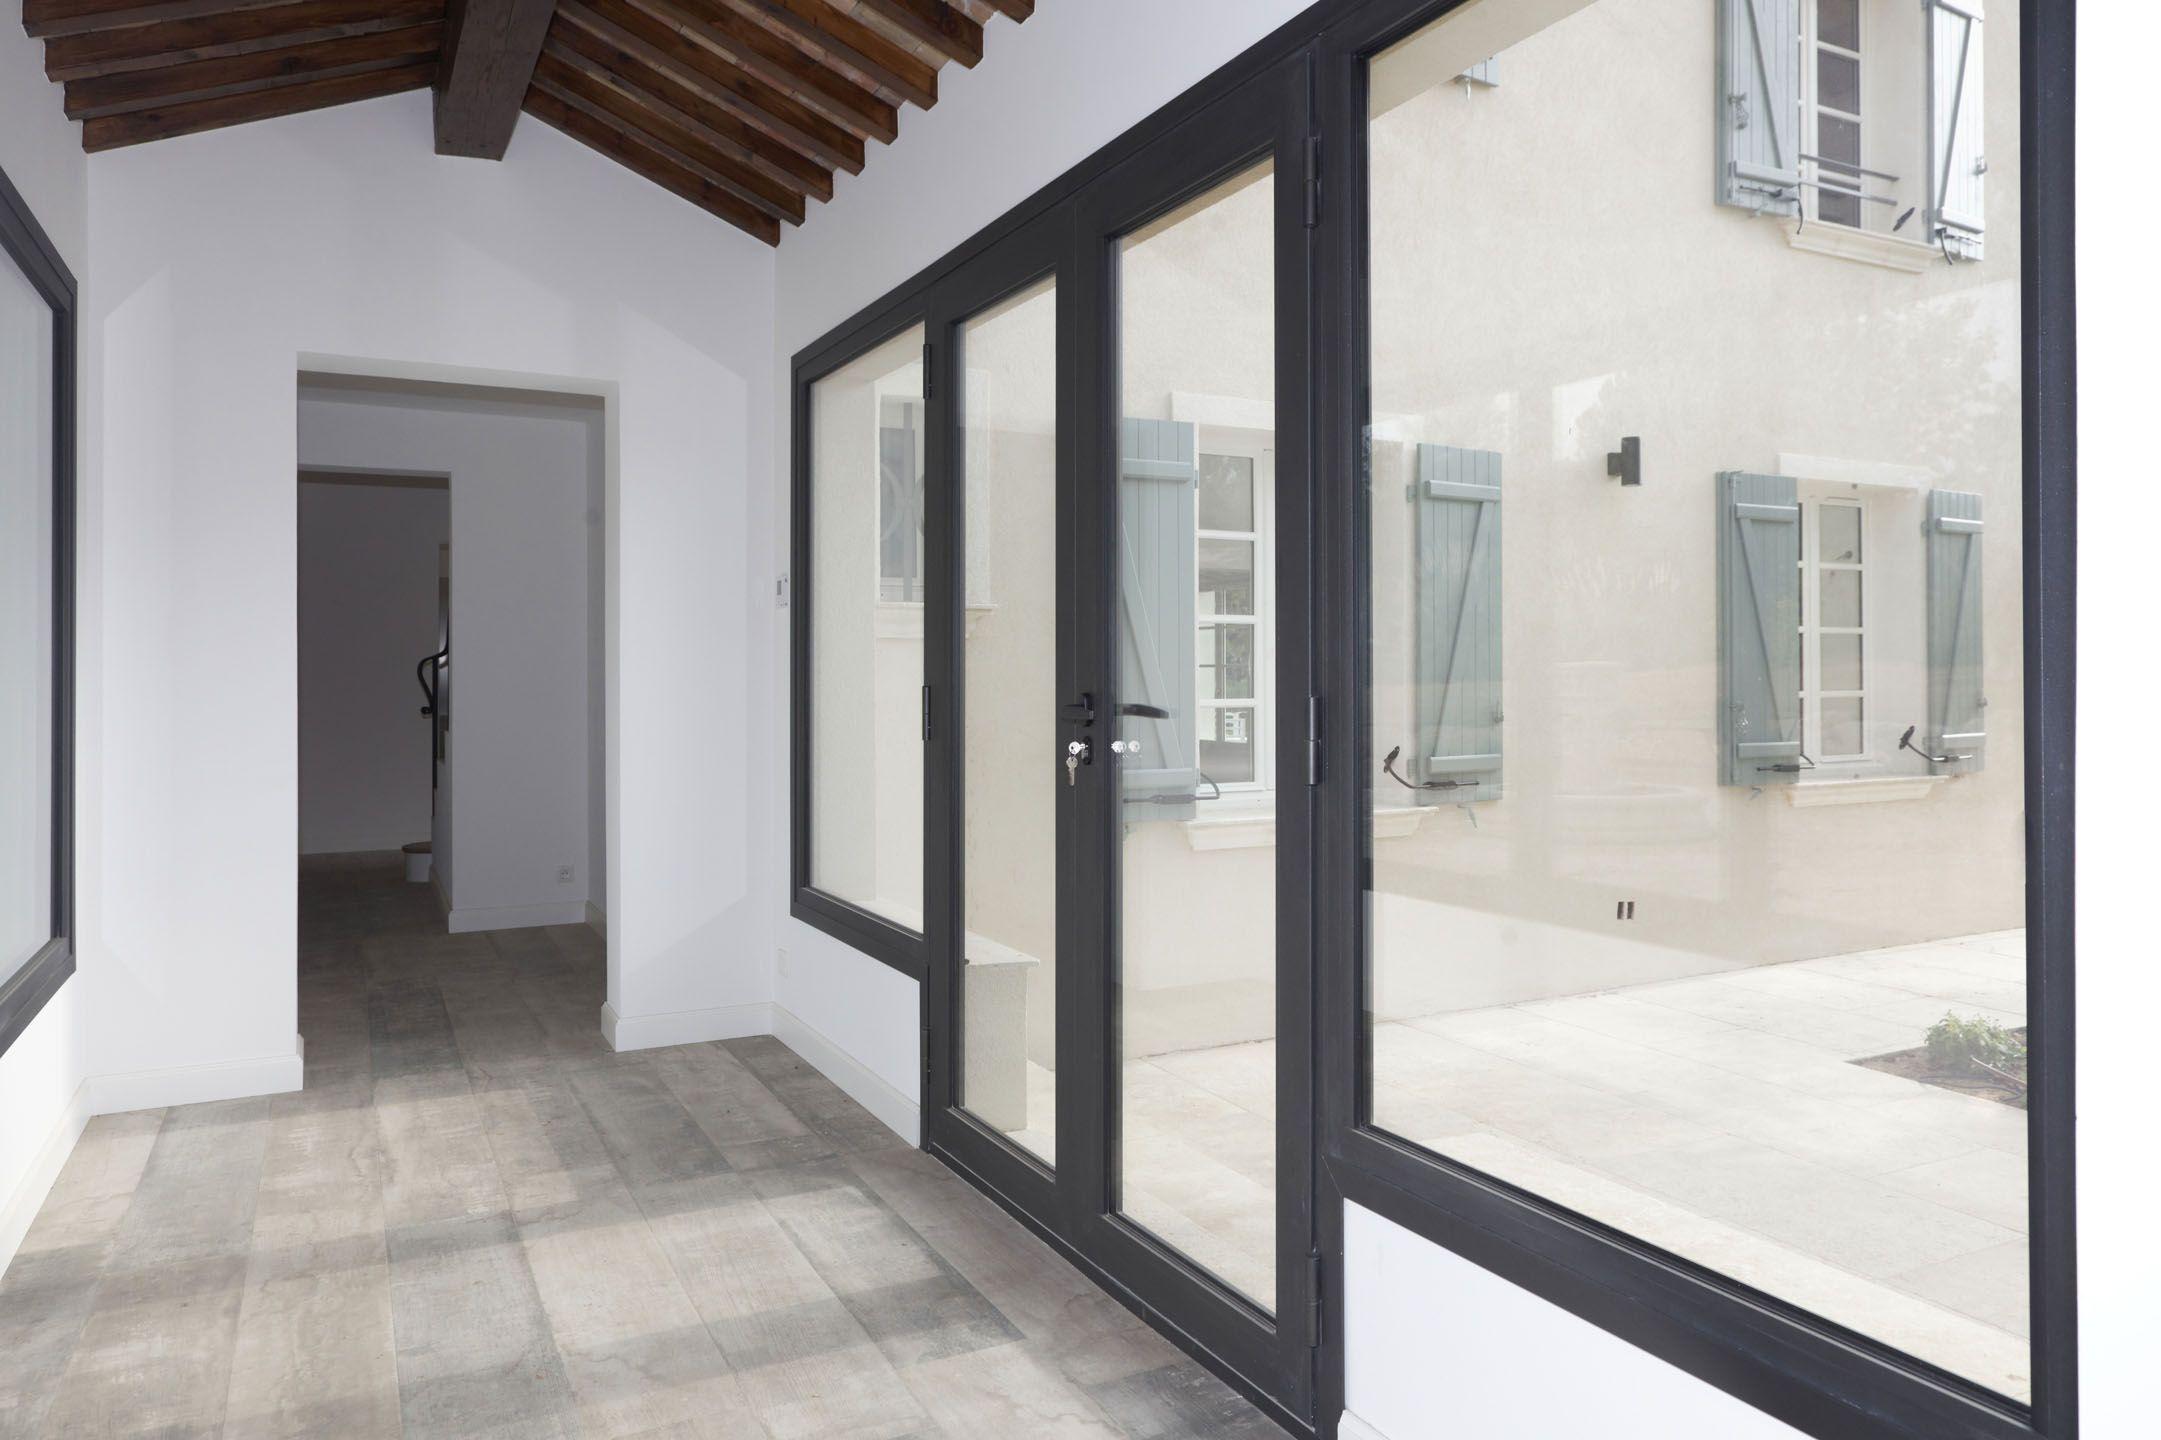 Porte de baie vitr e r alis par rafflin alu pvc for Baie vitree pvc